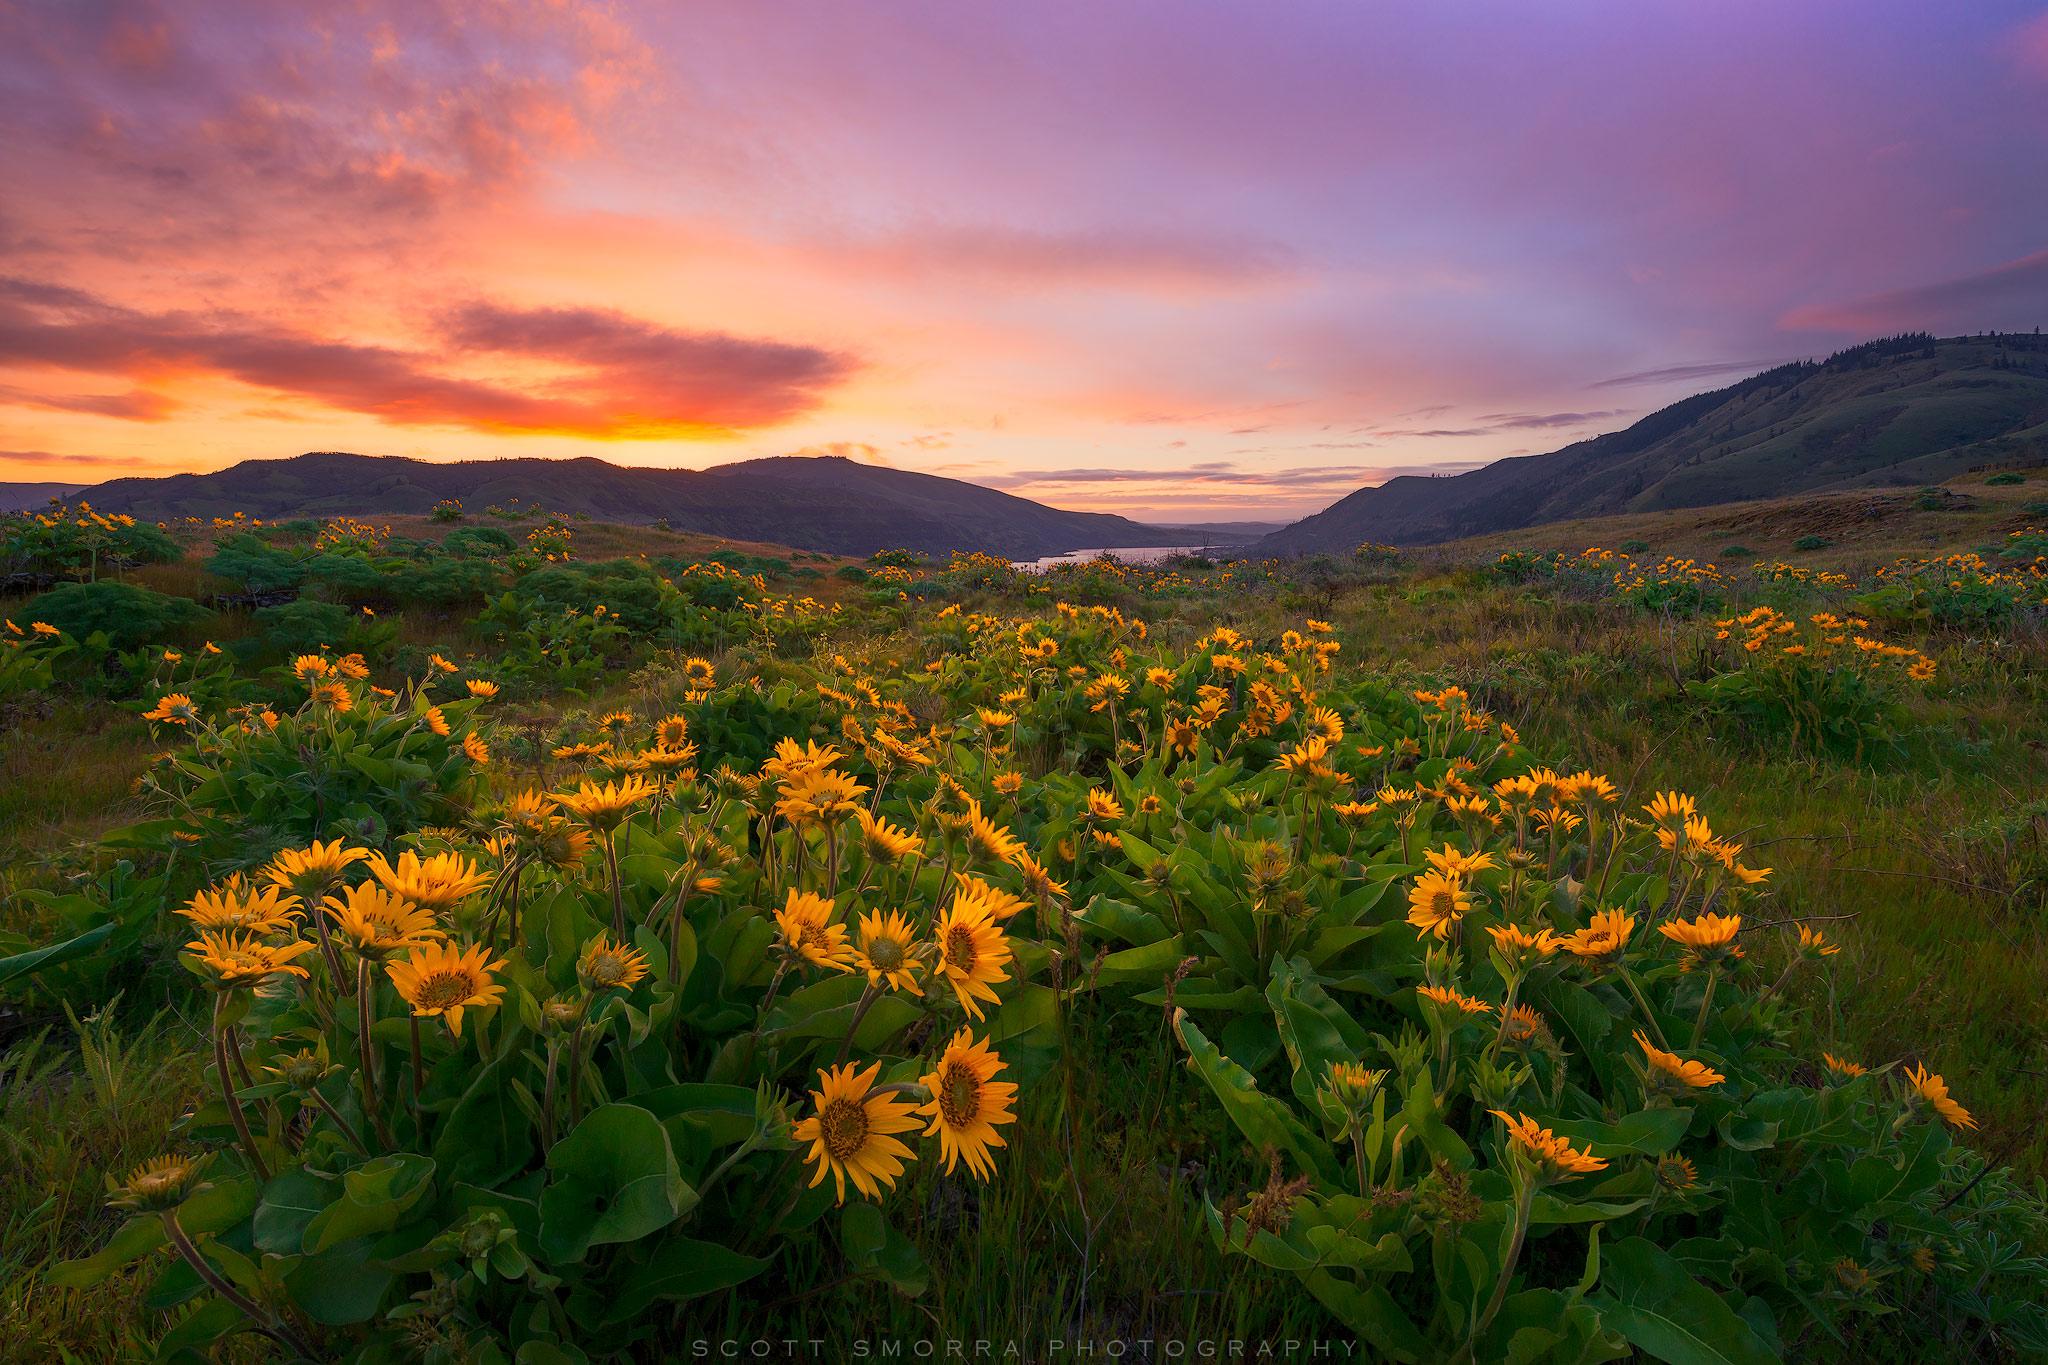 Oregon, Columbia River Gorge, Rowena Crest, spring, sunrise, Arrowleaf, balsamroot, wildflowers, photo